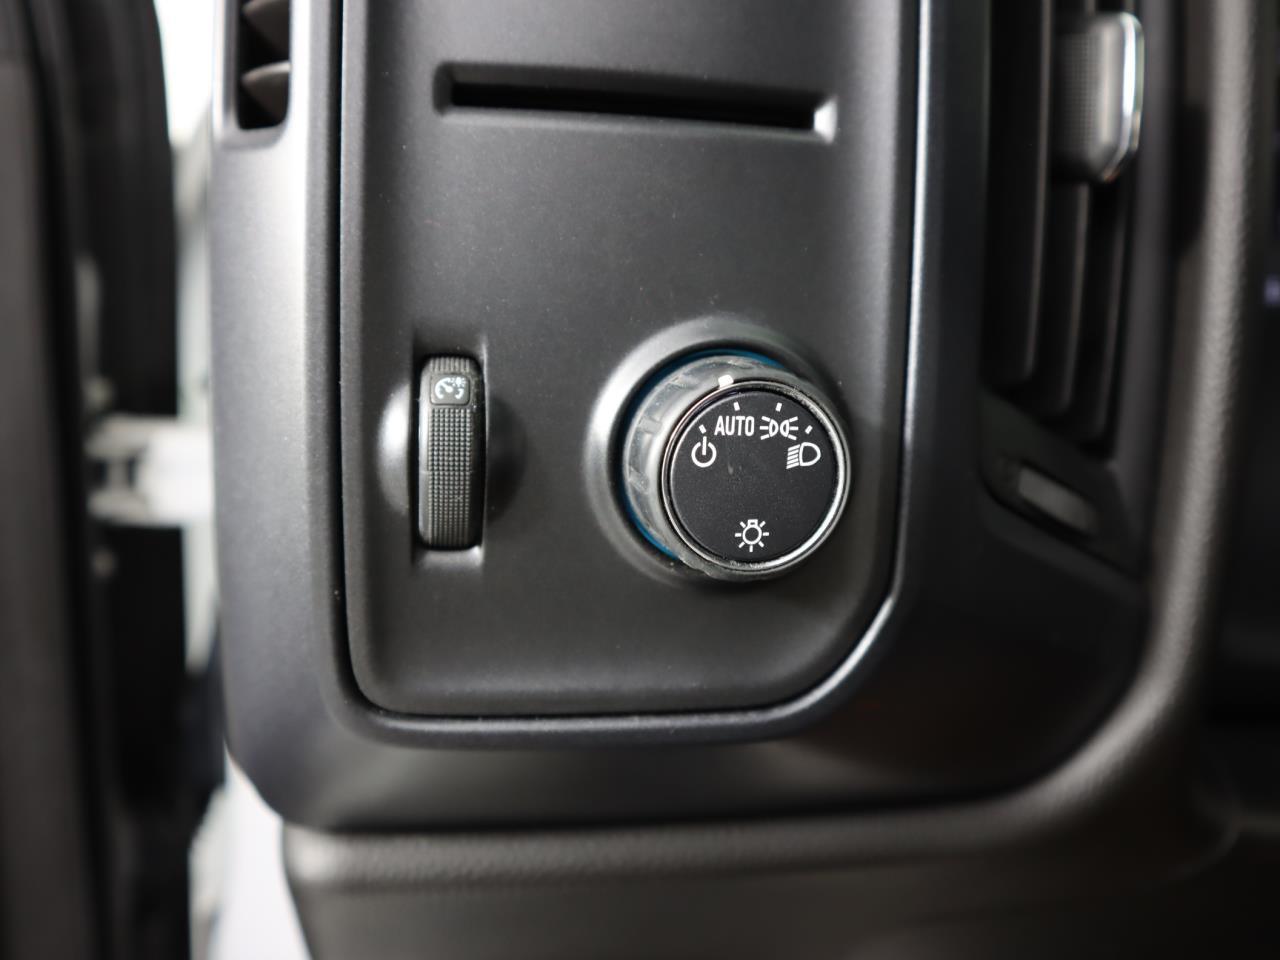 used vehicle - Truck CHEVROLET SILVERADO 1500 2018